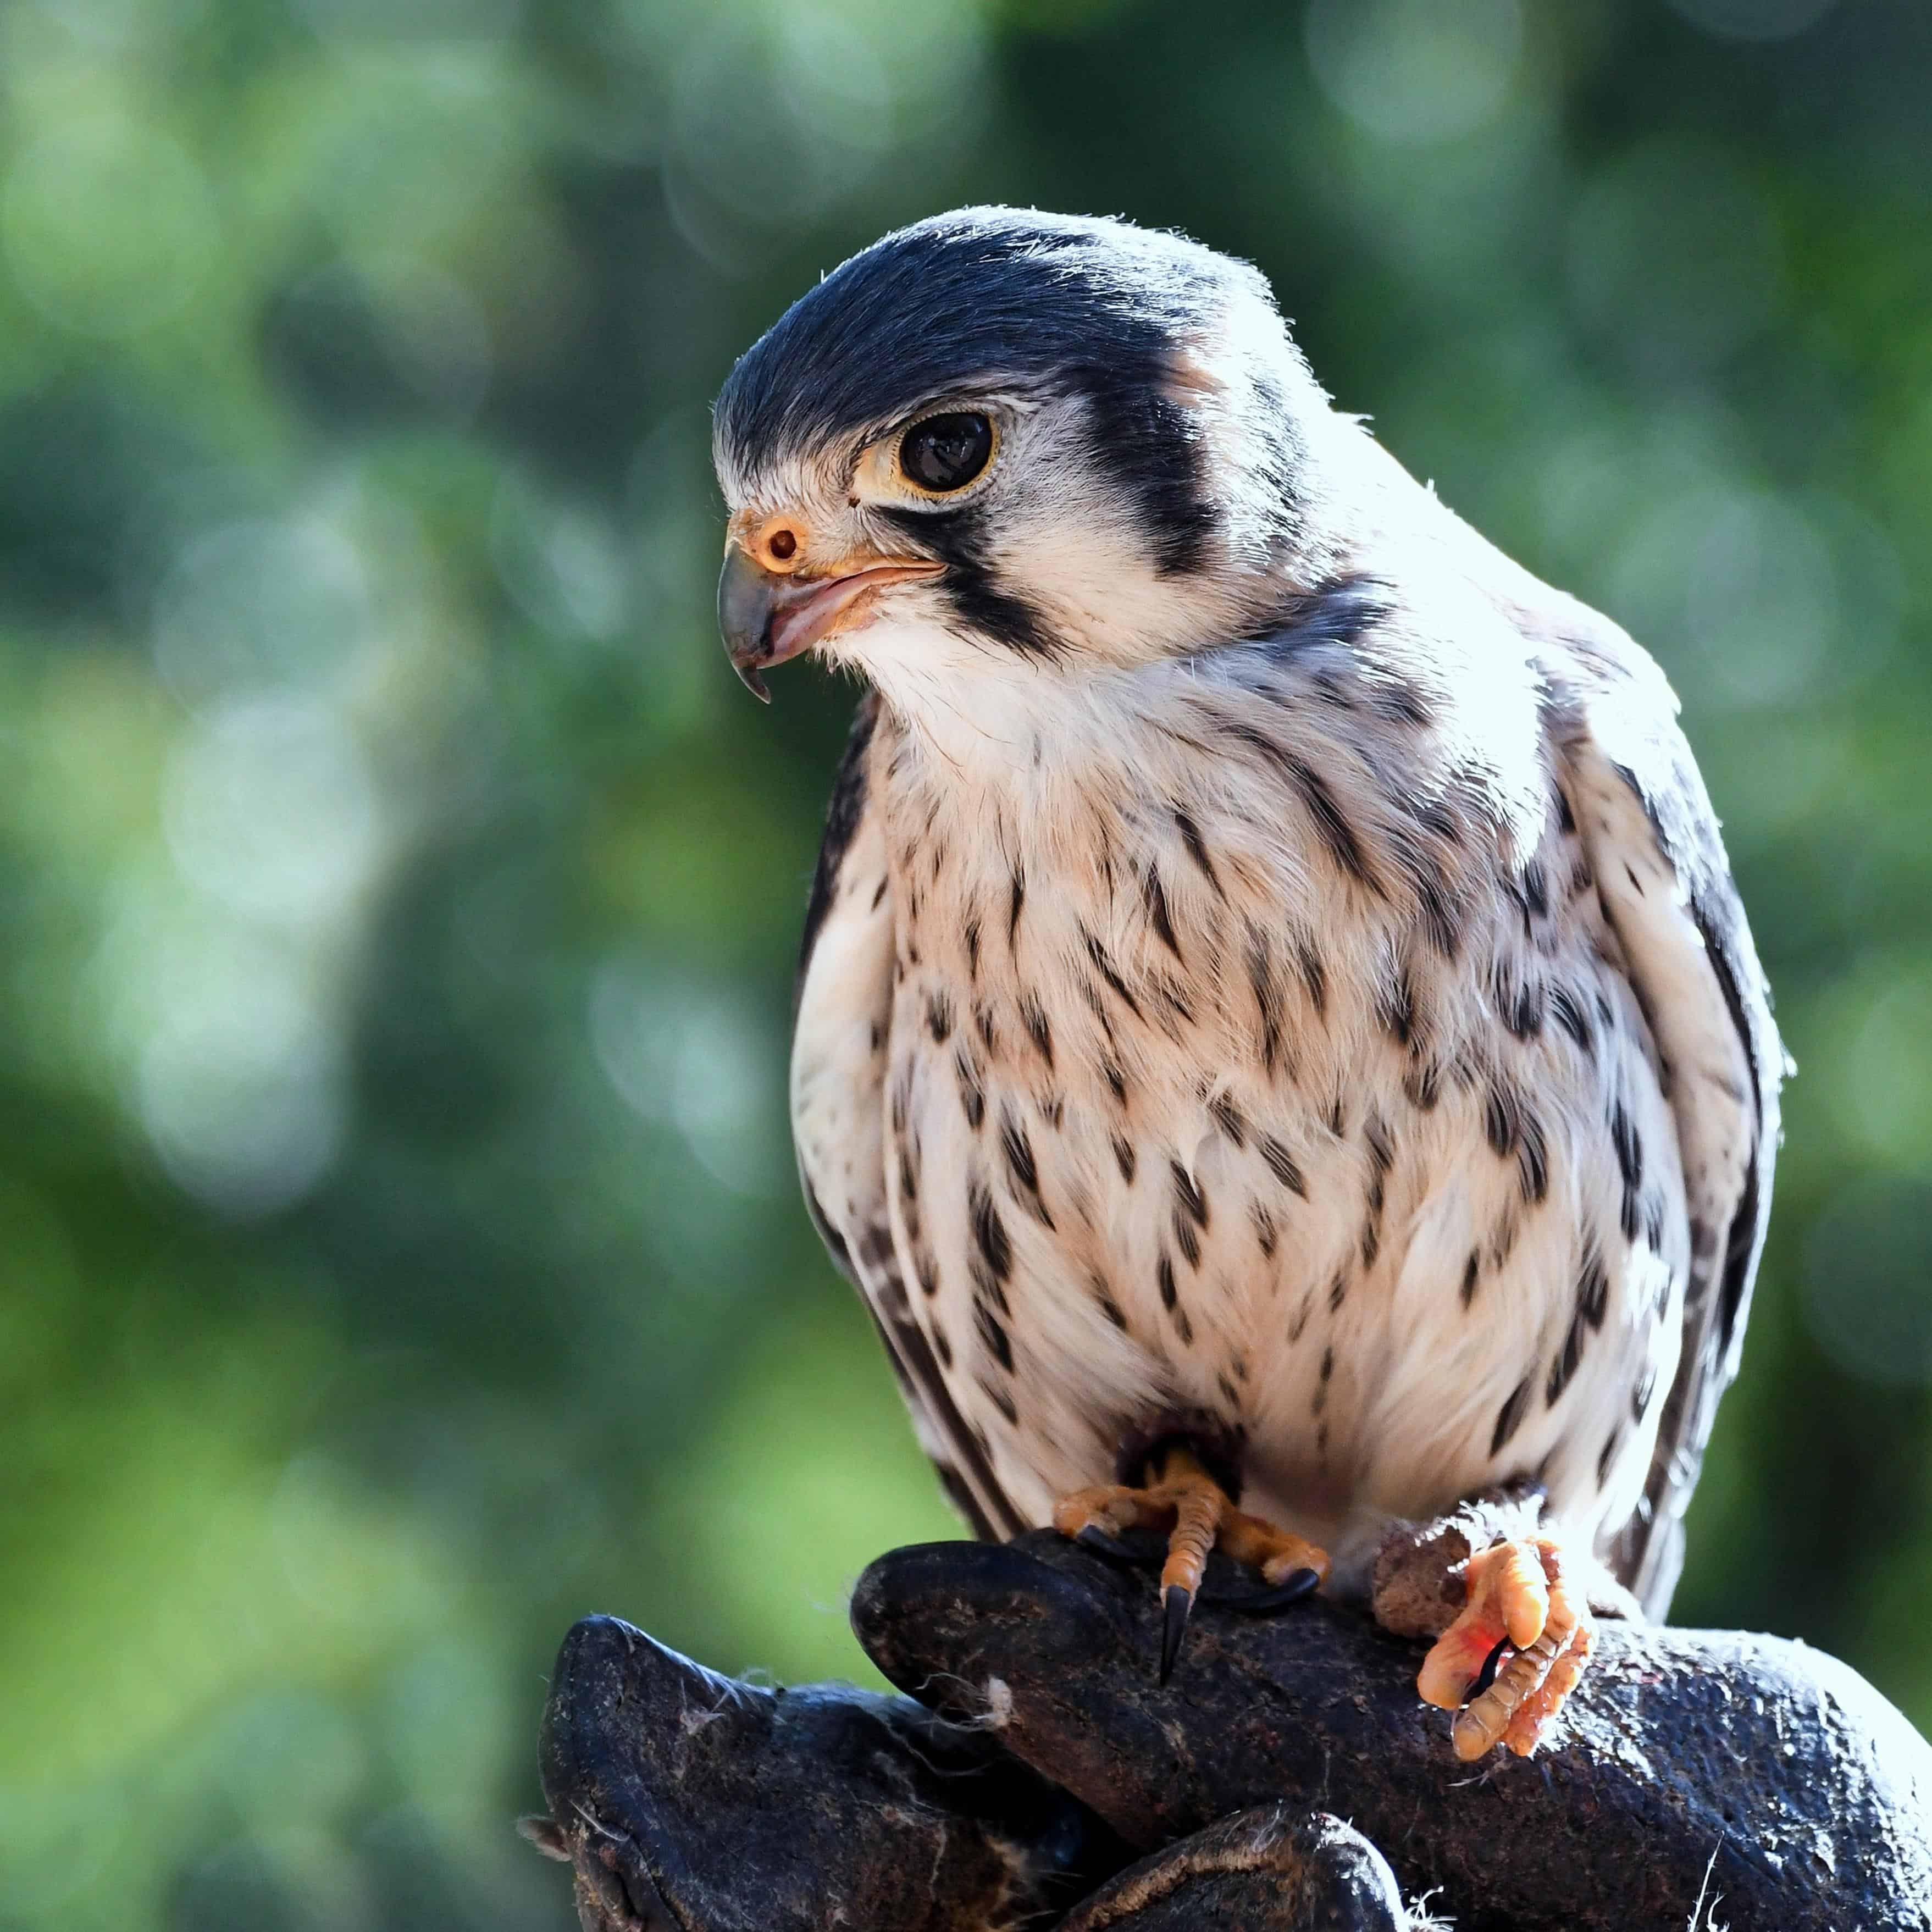 Gambar gratis: burung, falcon, hewan, satwa liar, burung ...